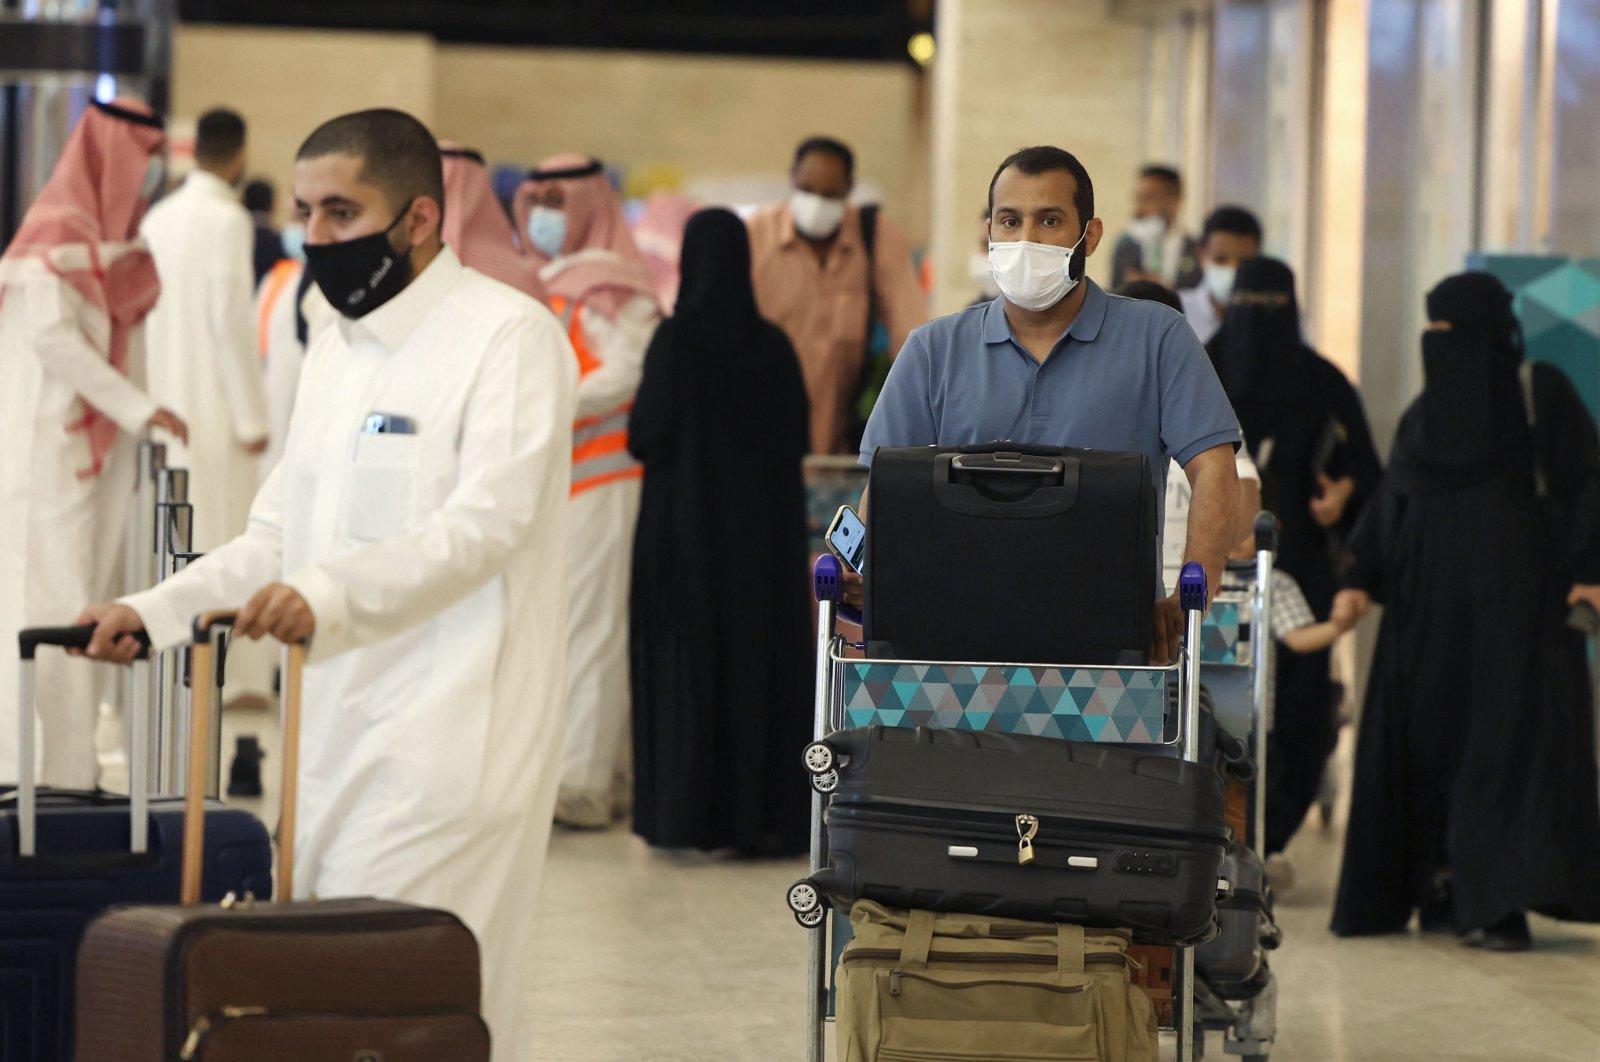 Saudi passengers arrive at King Khaled International airport in the capital Riyadh as Saudi authorities lift travel restrictions for citizens immunized against COVID-19, Riyadh, Saudi Arabia, May 17, 2021. (AFP Photo)